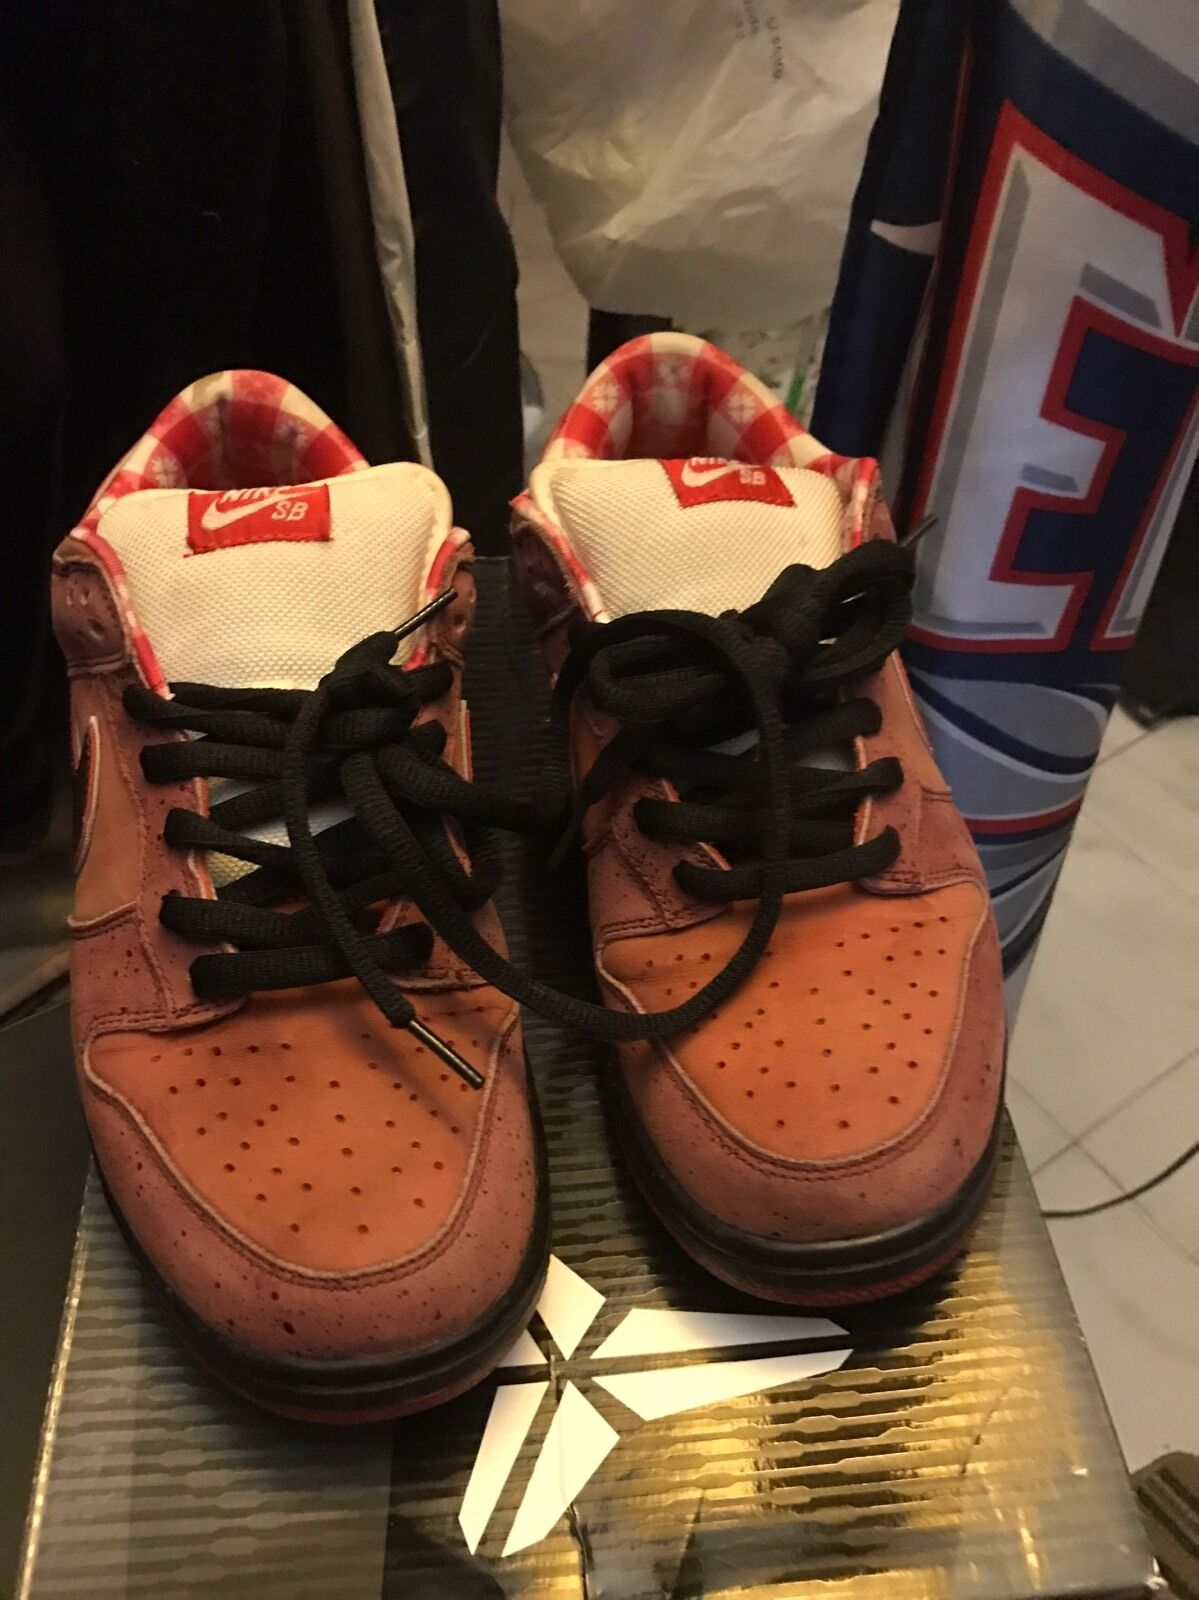 Nike sb red lobster sz 11 schiacciare in basso